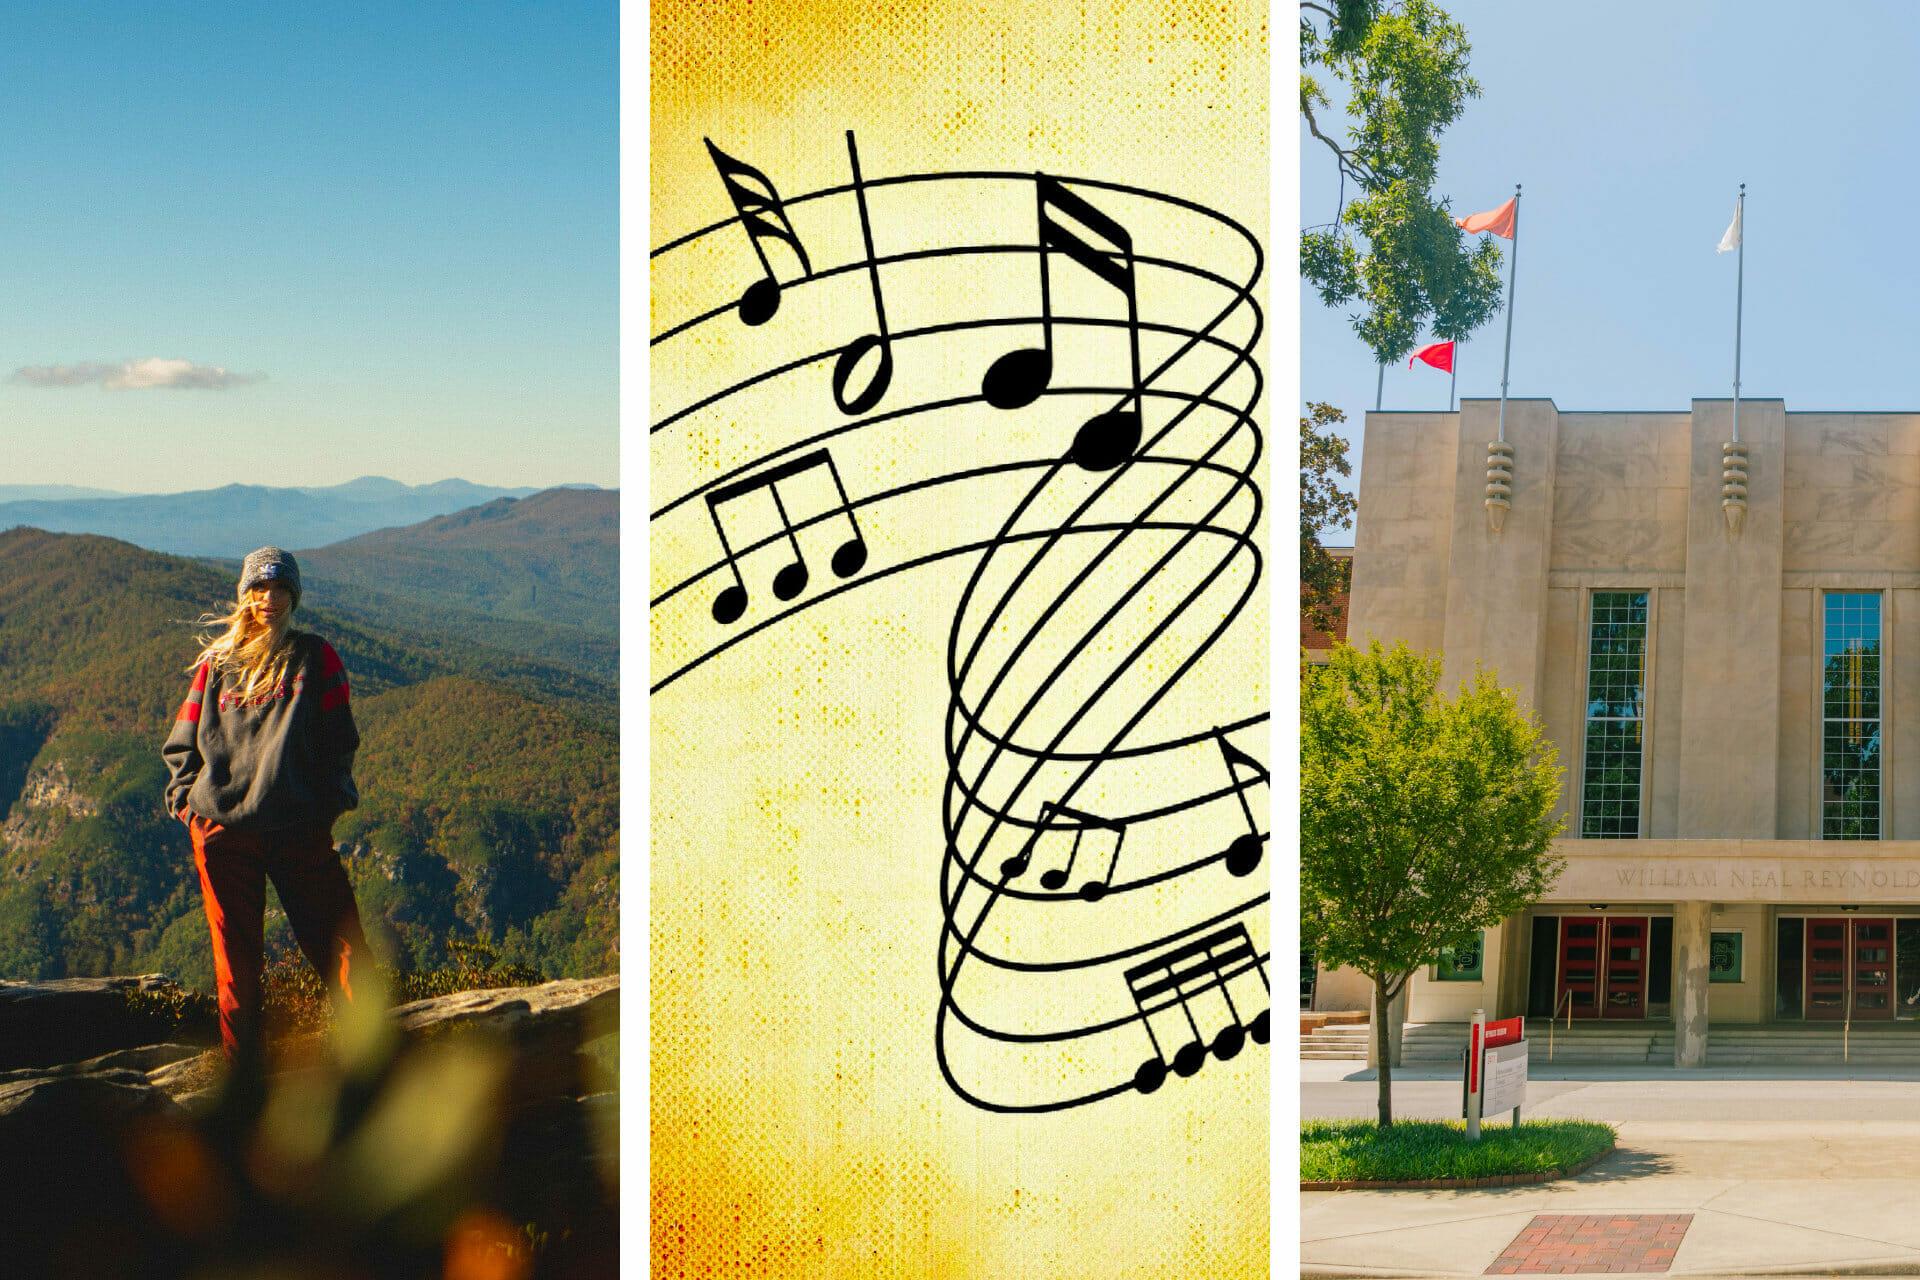 35+ Songs about North Carolina to Brighten Your Day via @allamericanatlas